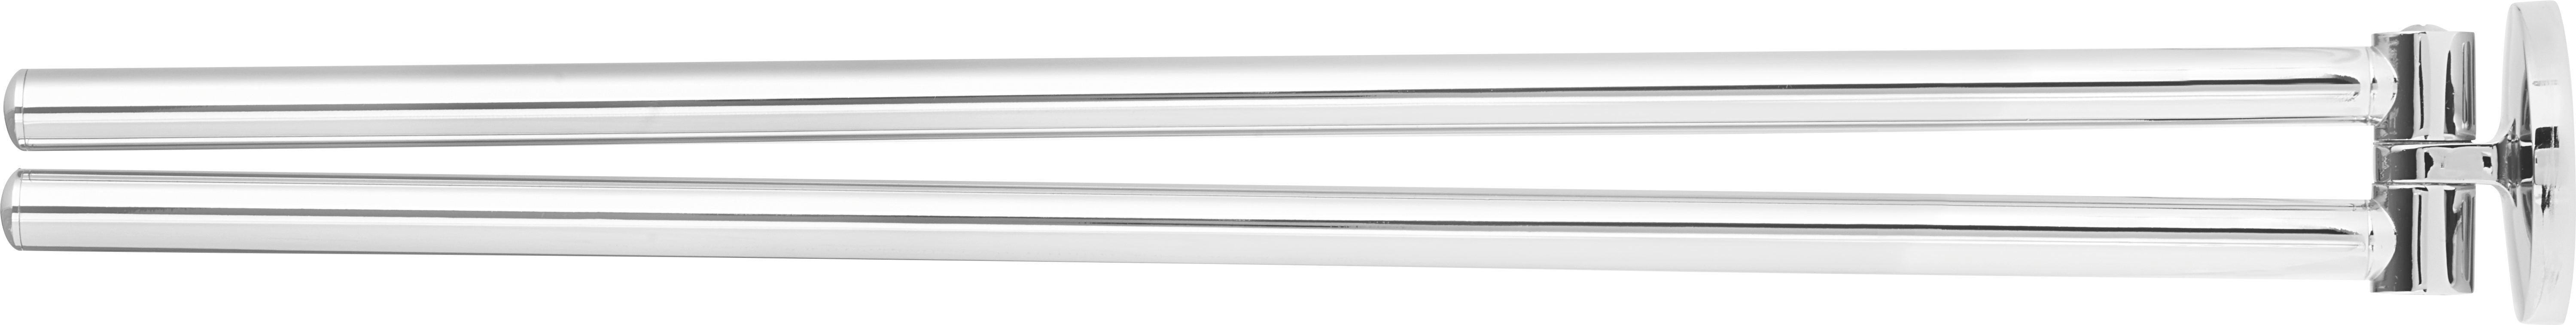 Handtuchhalter in Chromfarben - Chromfarben, Metall (6/6/48cm) - MÖMAX modern living